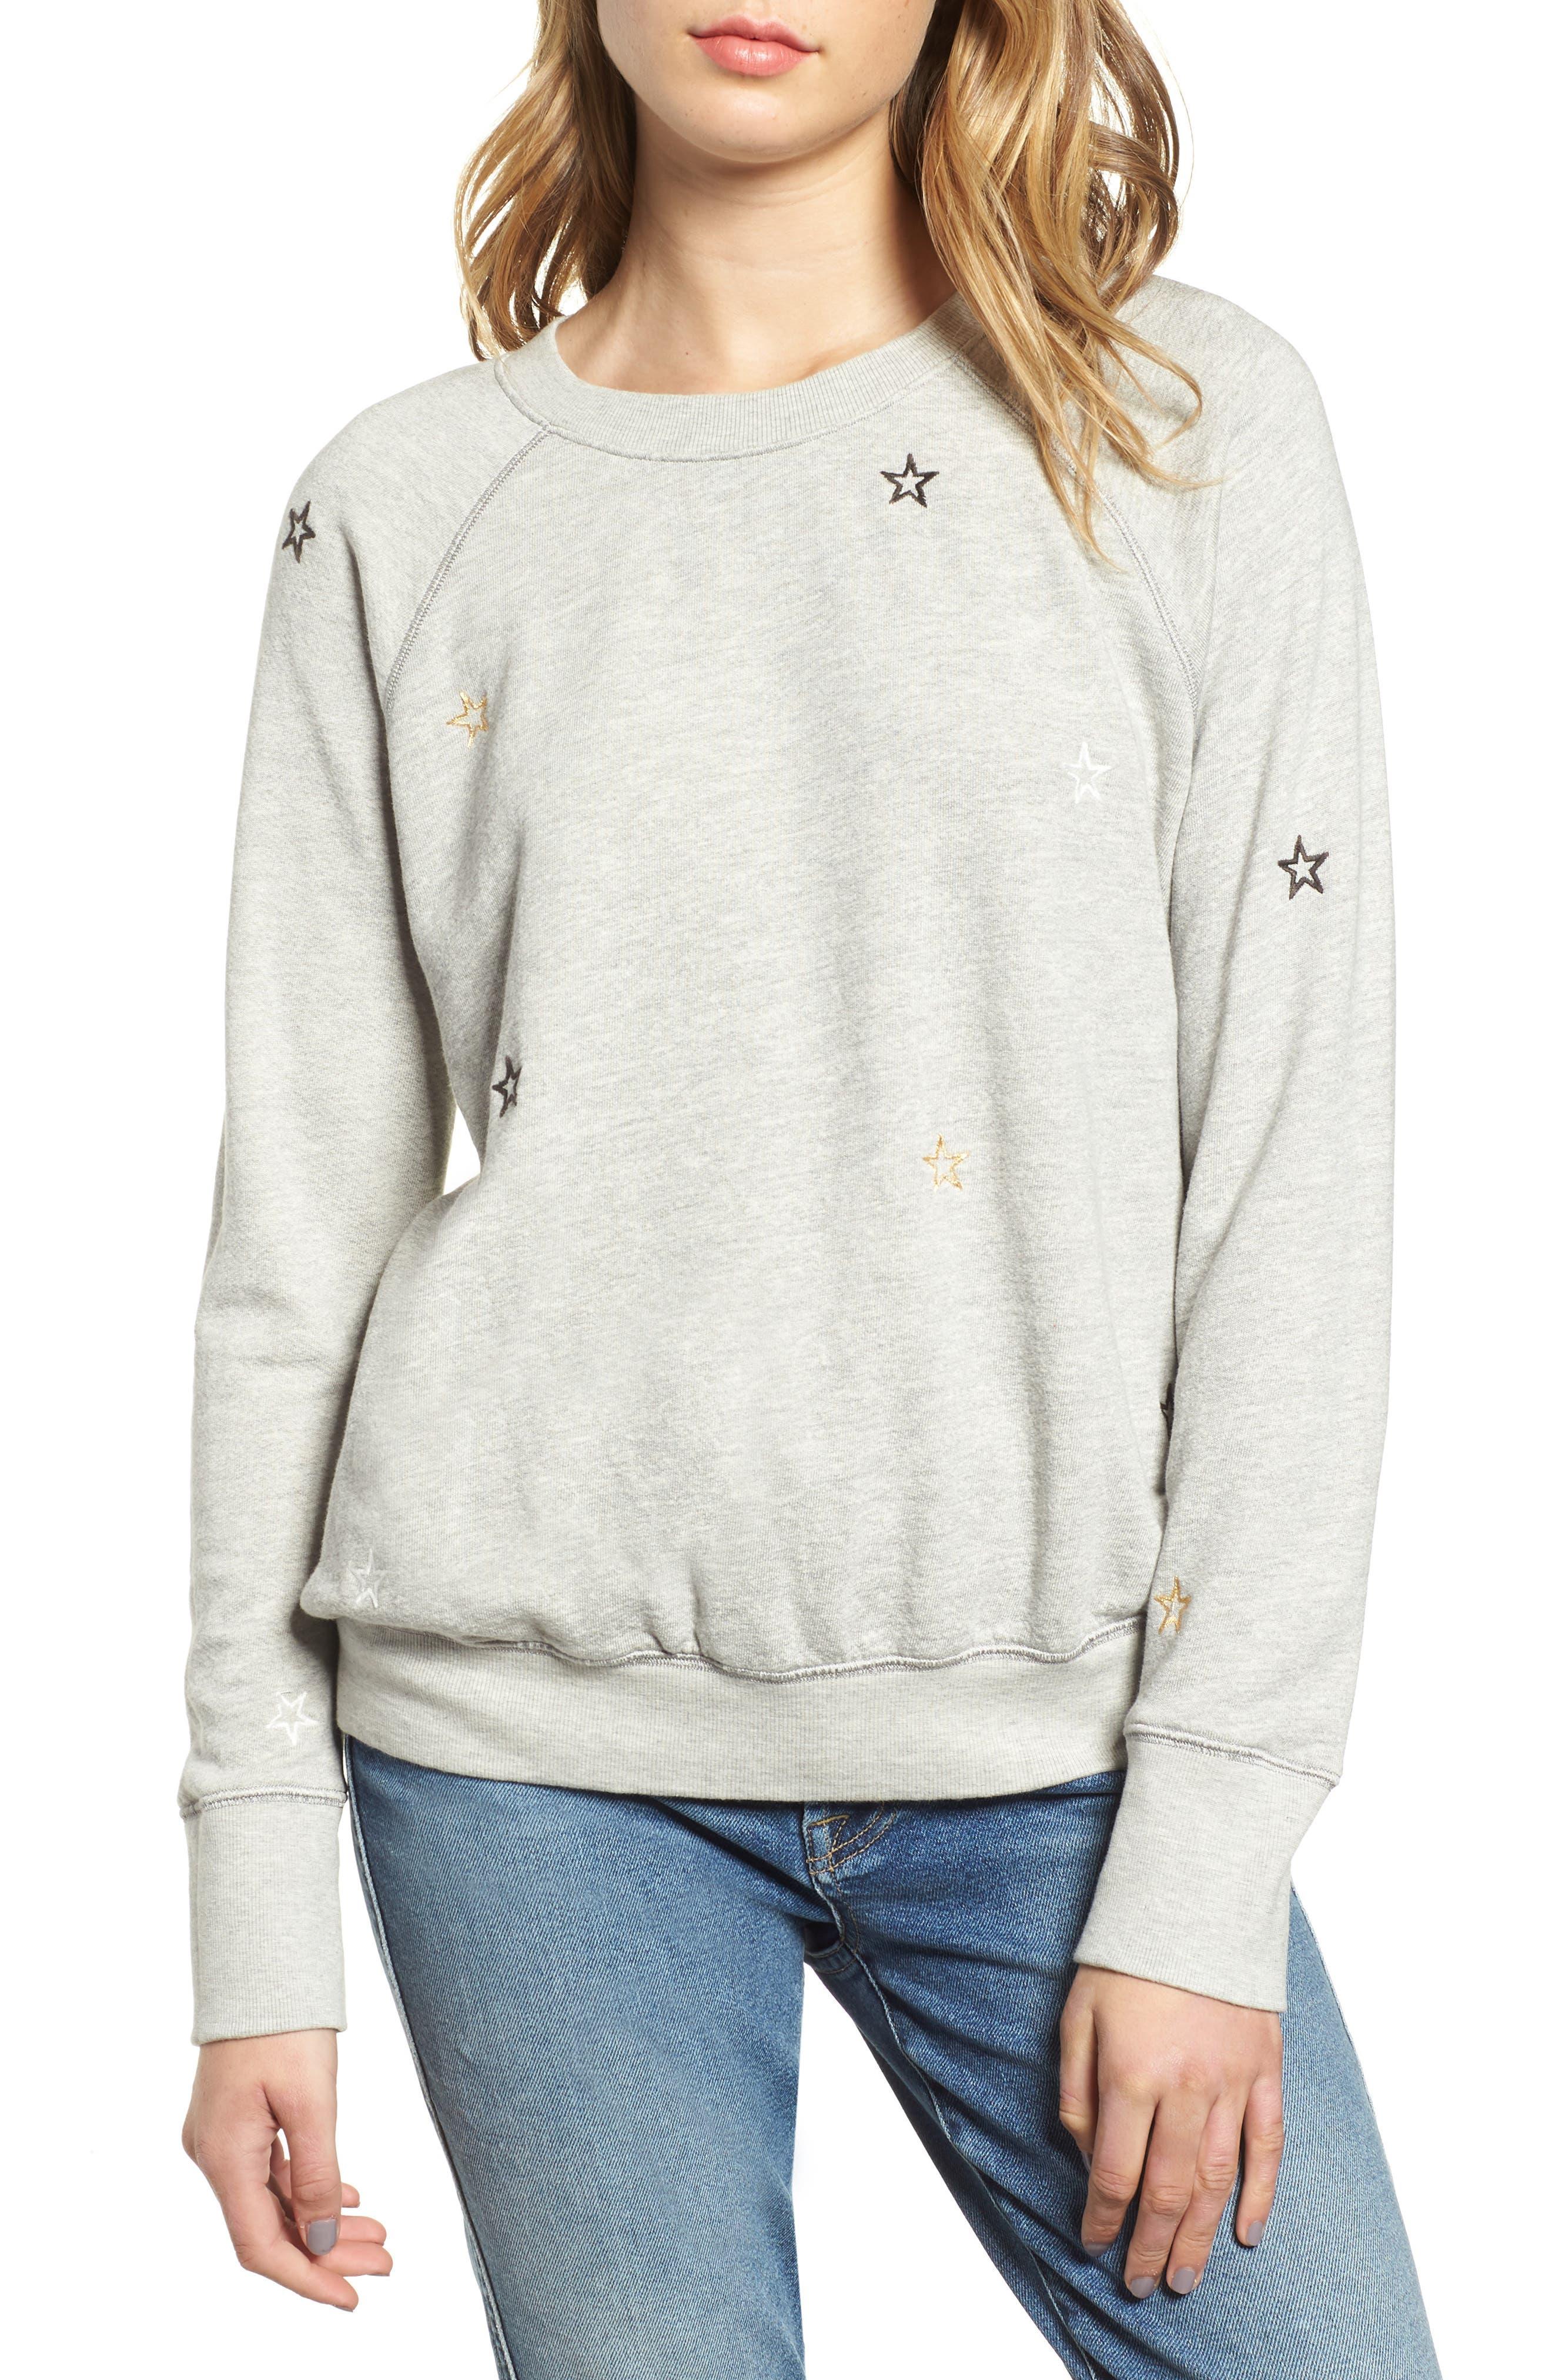 Star Embroidered Sweatshirt,                             Main thumbnail 1, color,                             HEATHER GREY